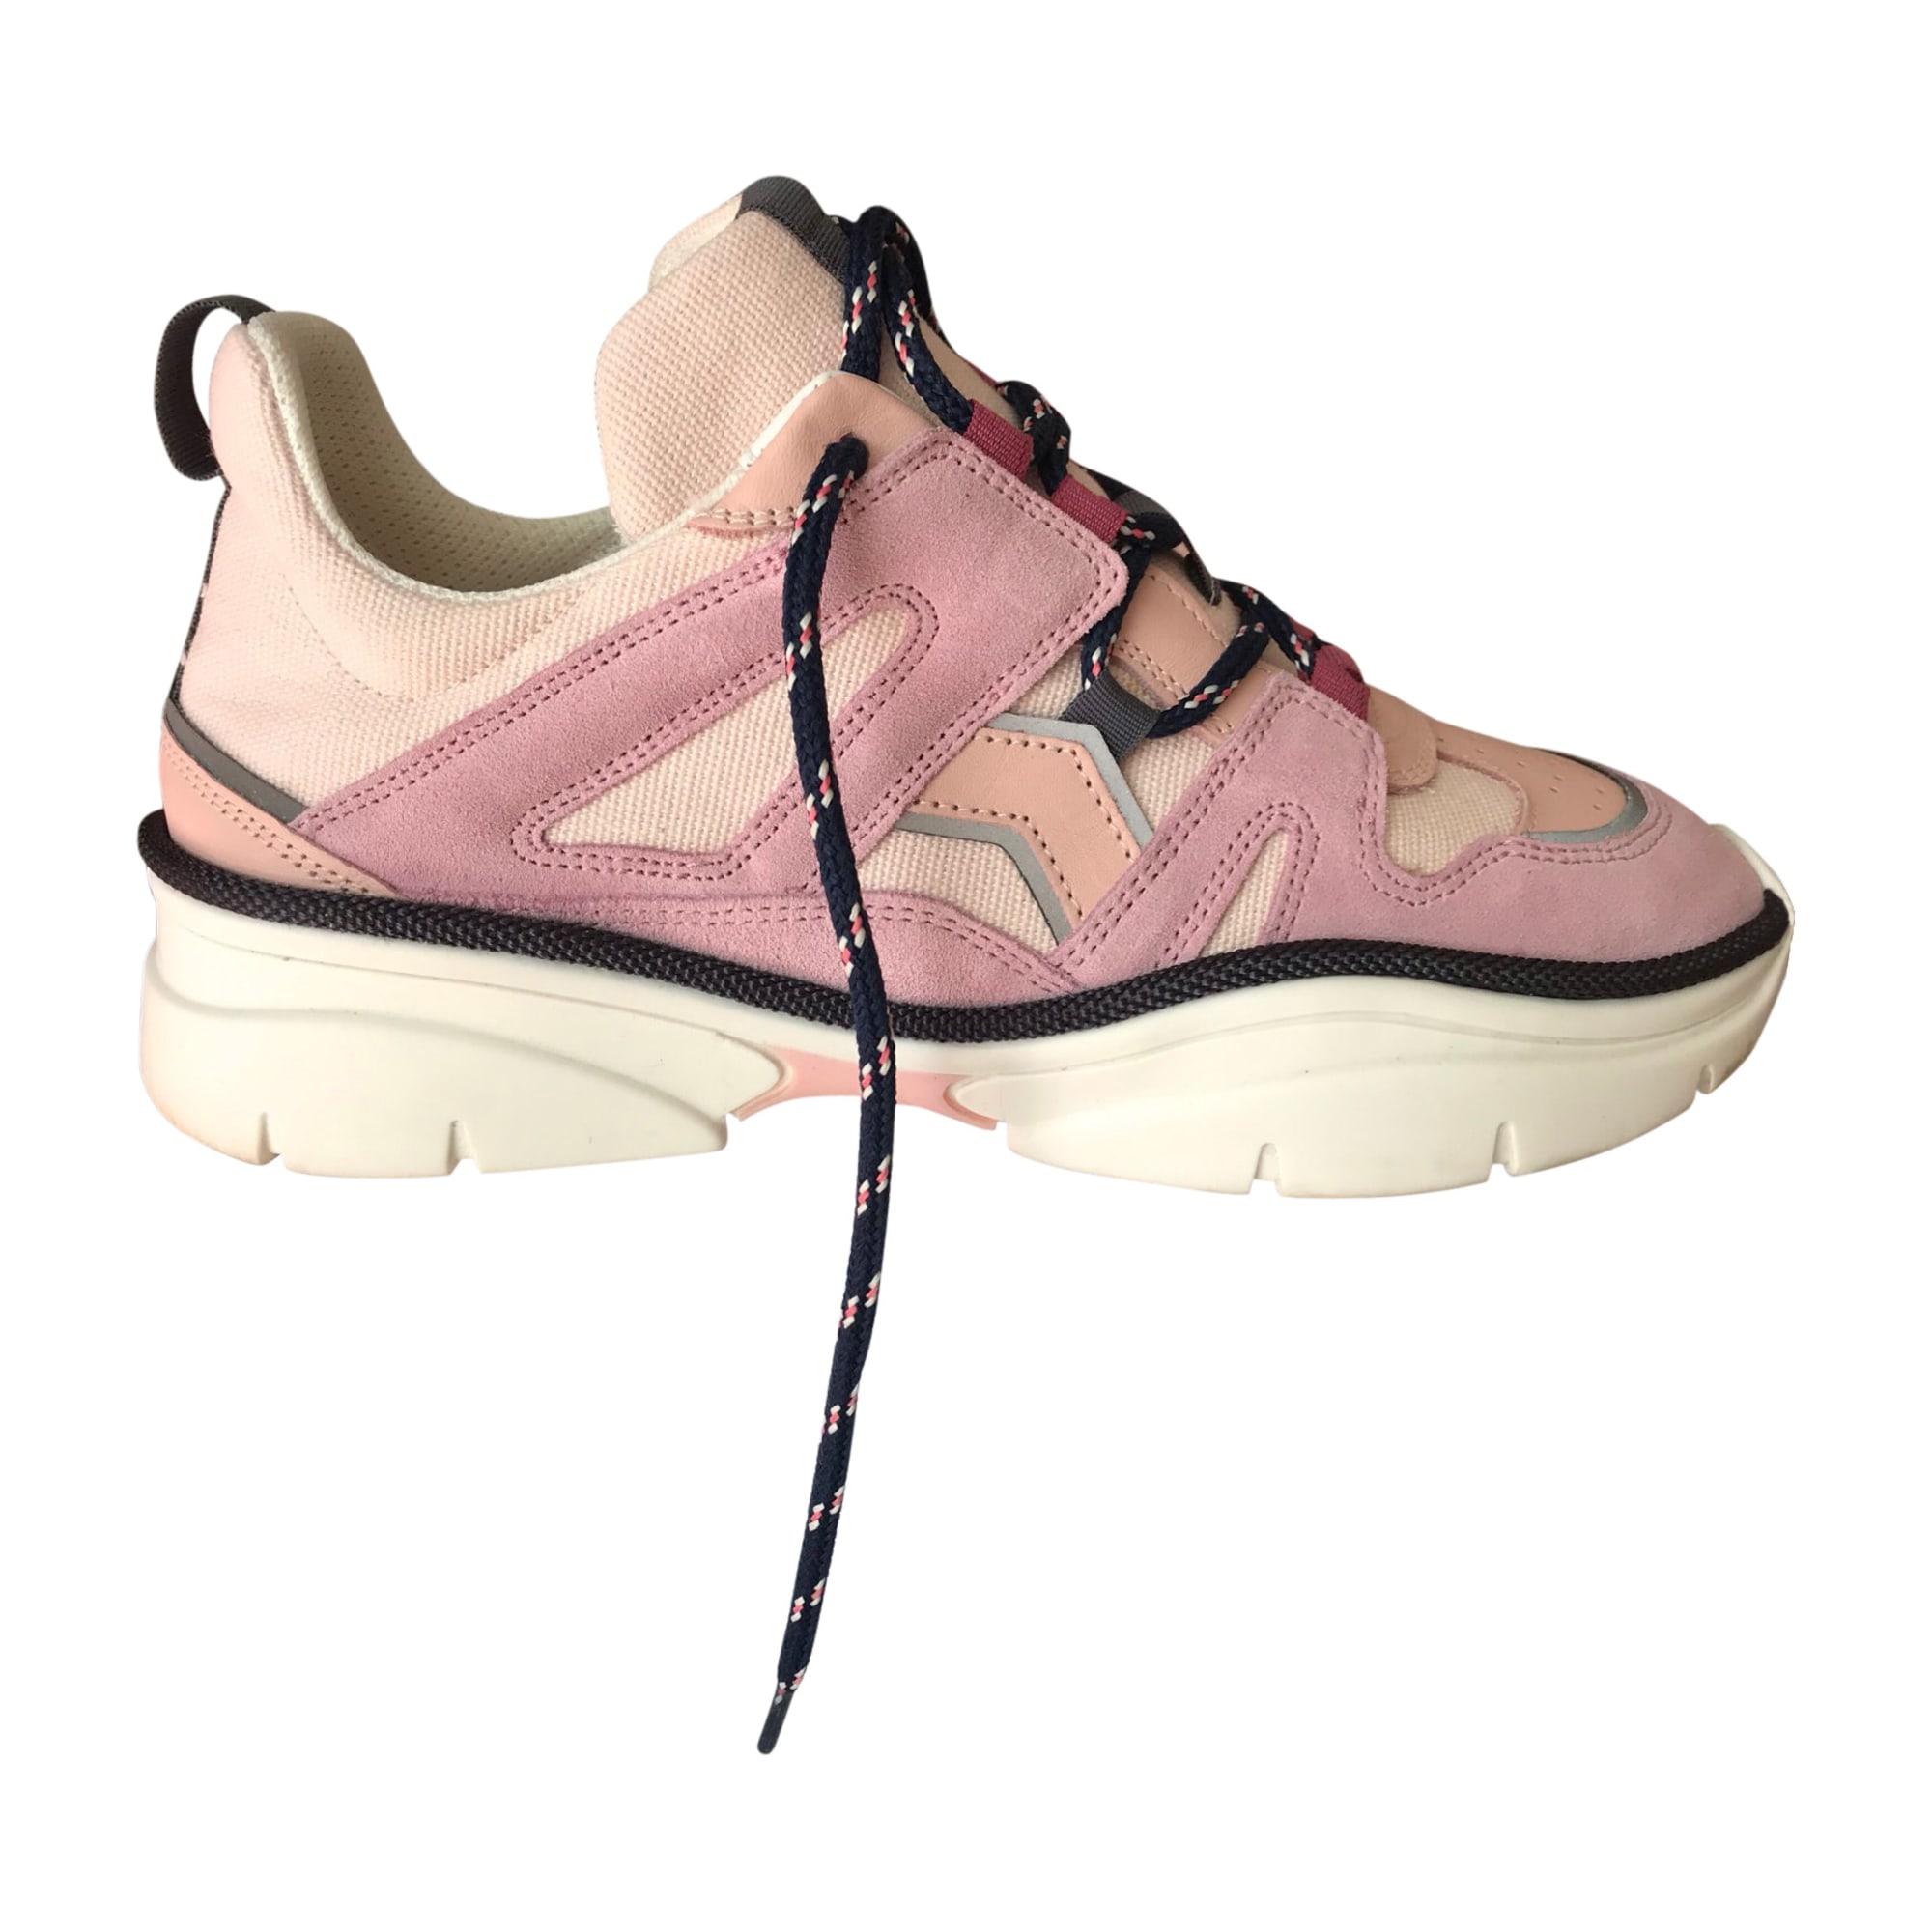 Sneakers ISABEL MARANT Pink, fuchsia, light pink